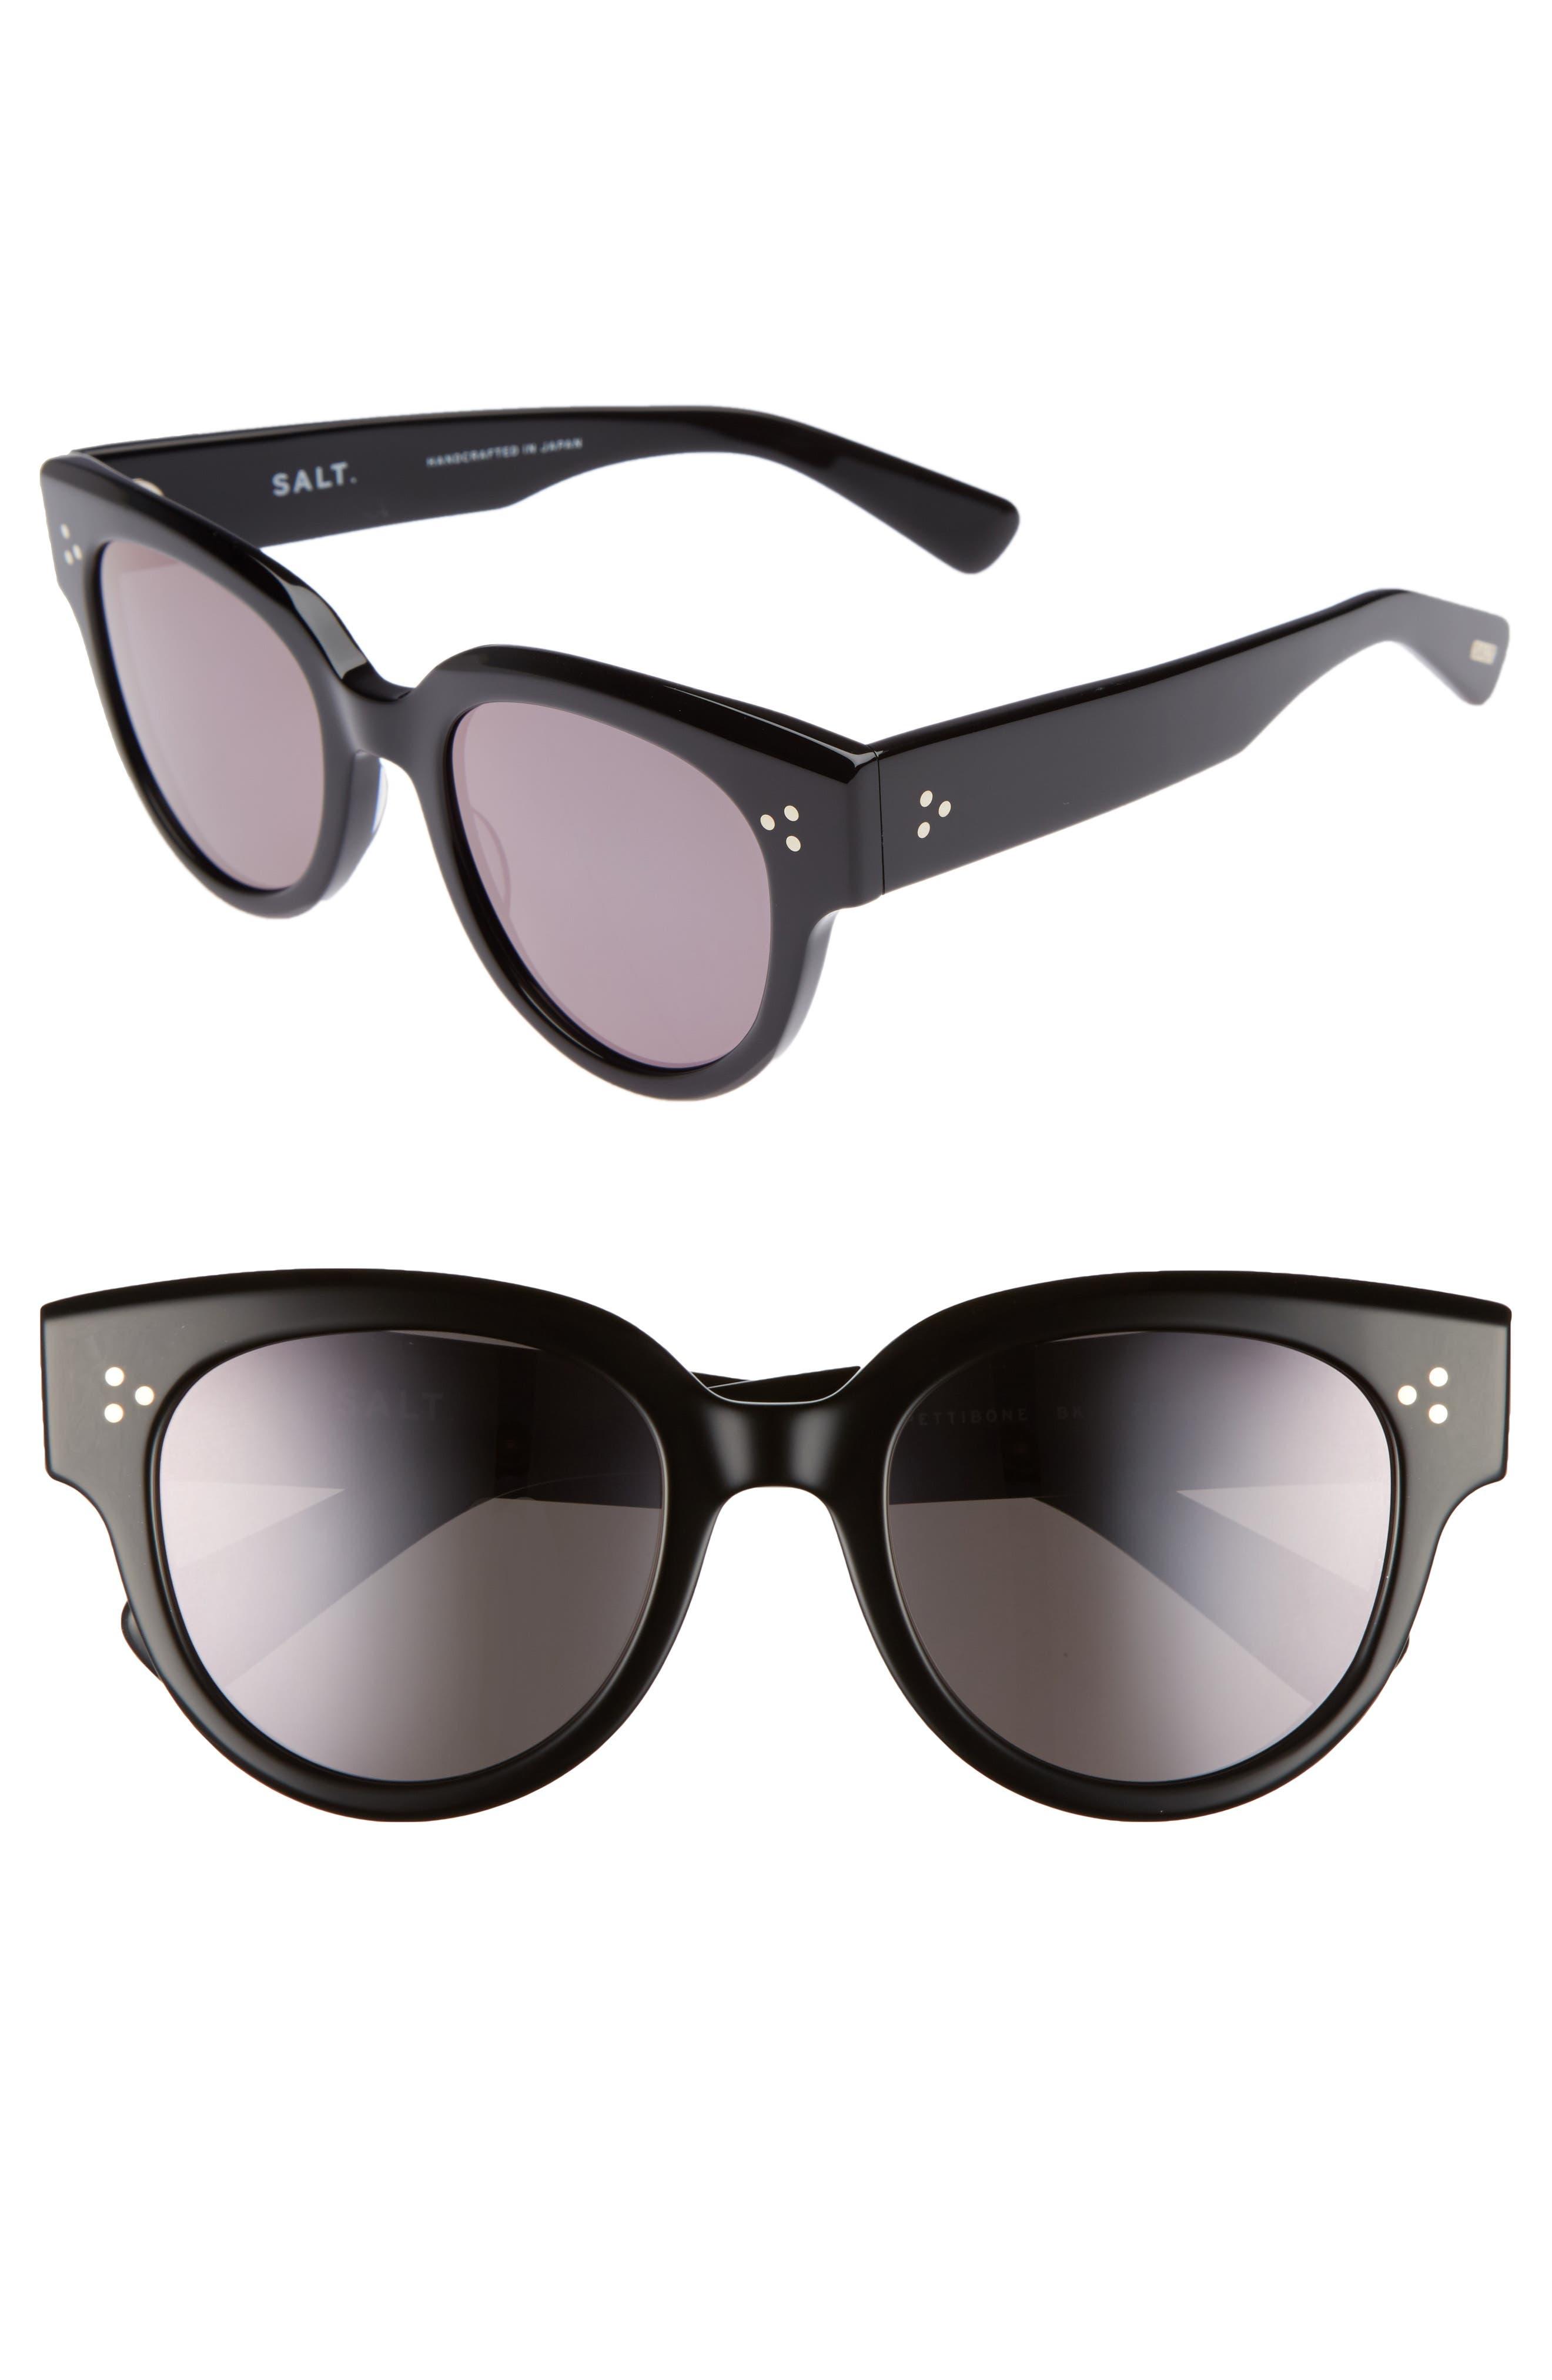 Pettibone 52mm Polarized Sunglasses,                             Main thumbnail 1, color,                             001